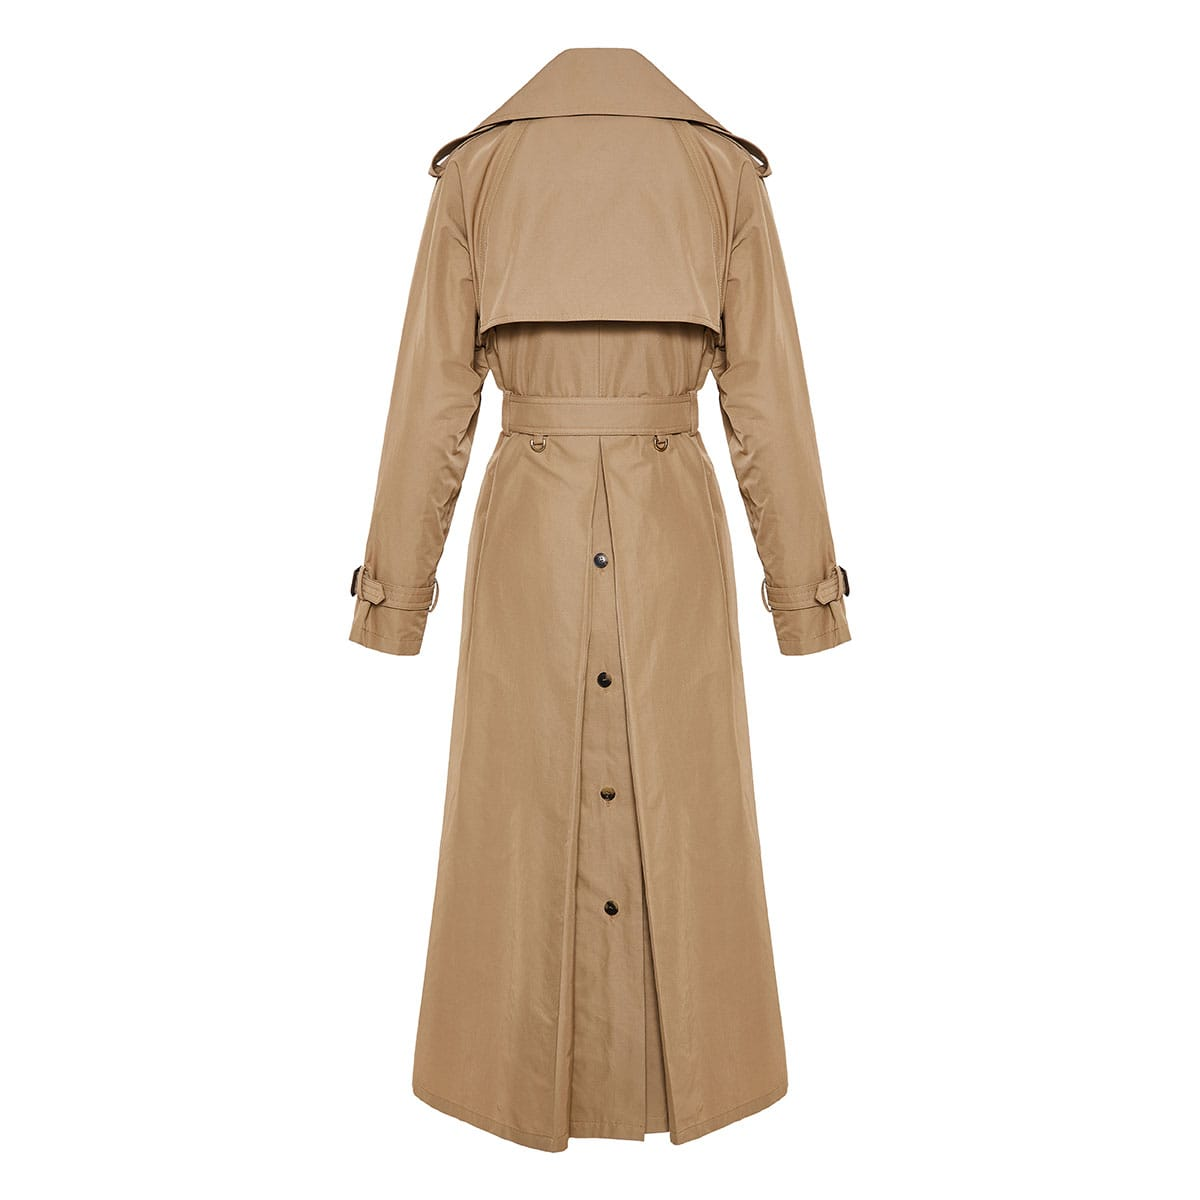 V-logo cotton trench coat